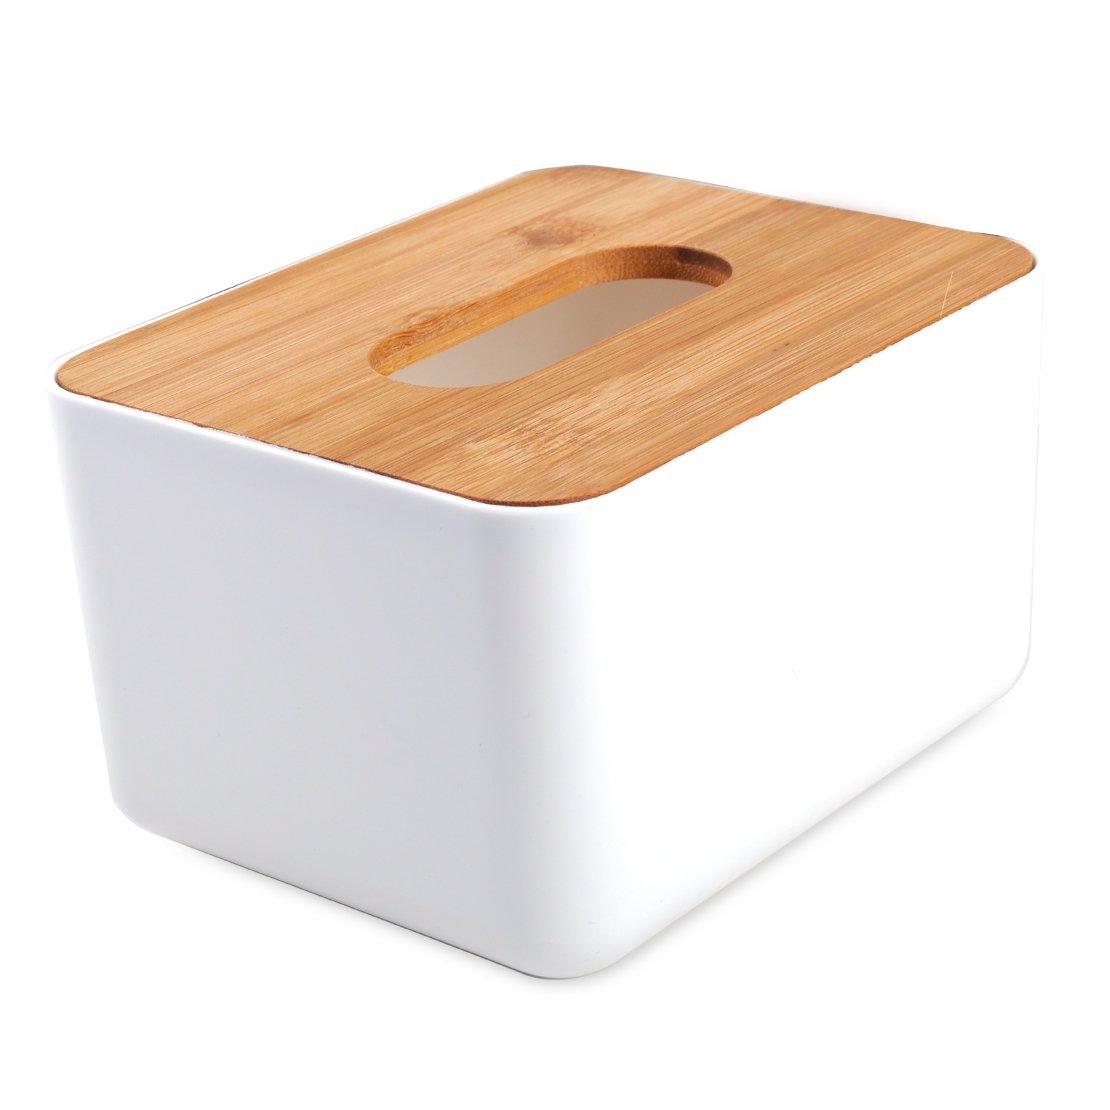 Wood Cover Plastic Tissue Box Napkin Paper Holder Dispenser Organizer Home Room Car Hotel